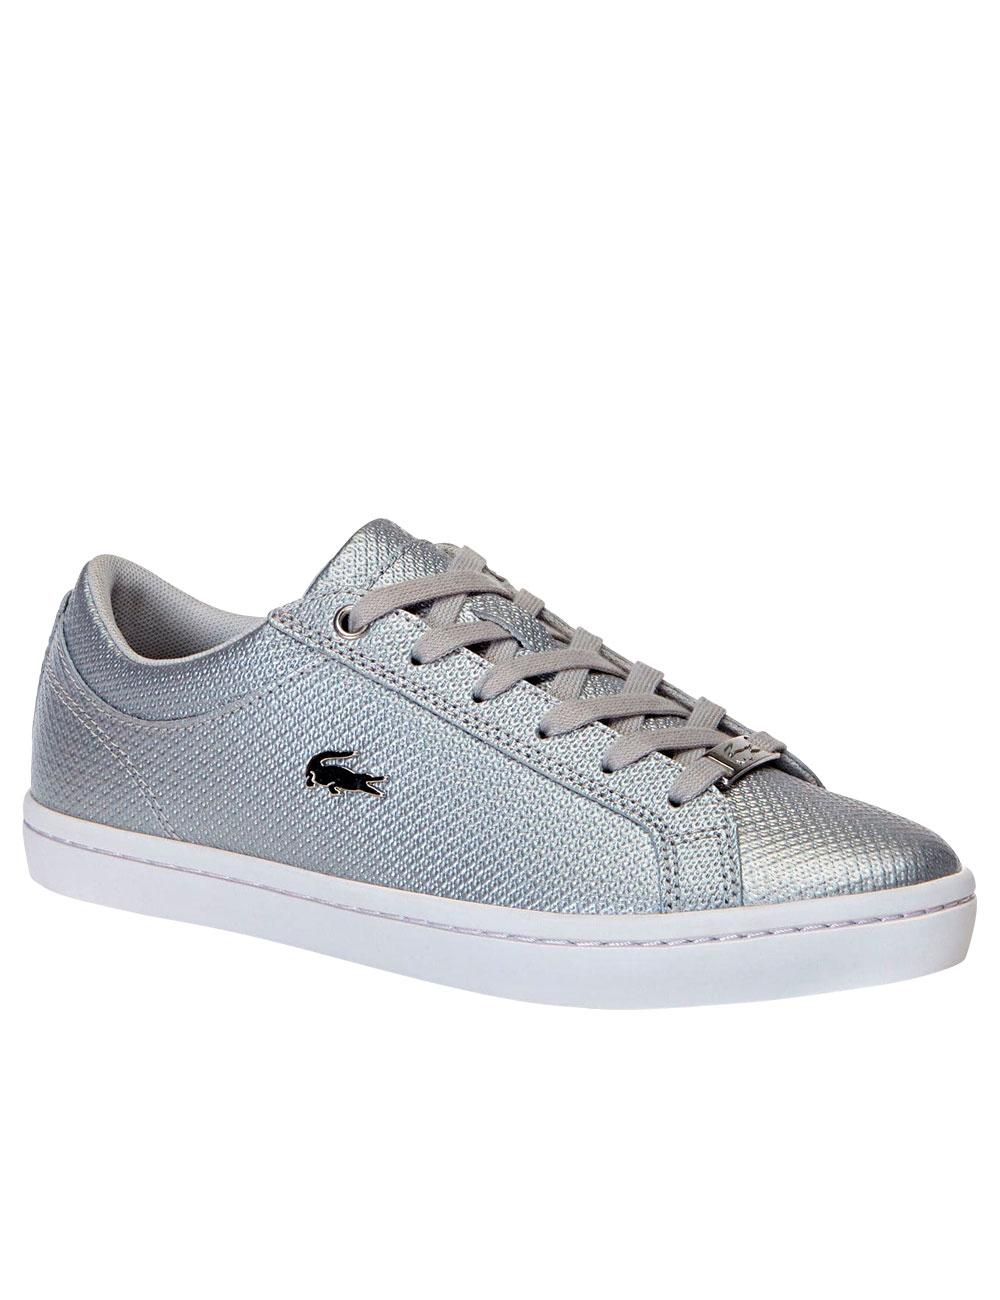 new style 3ea5c ff340 Damen Sneakers Lacoste, silber/weiss